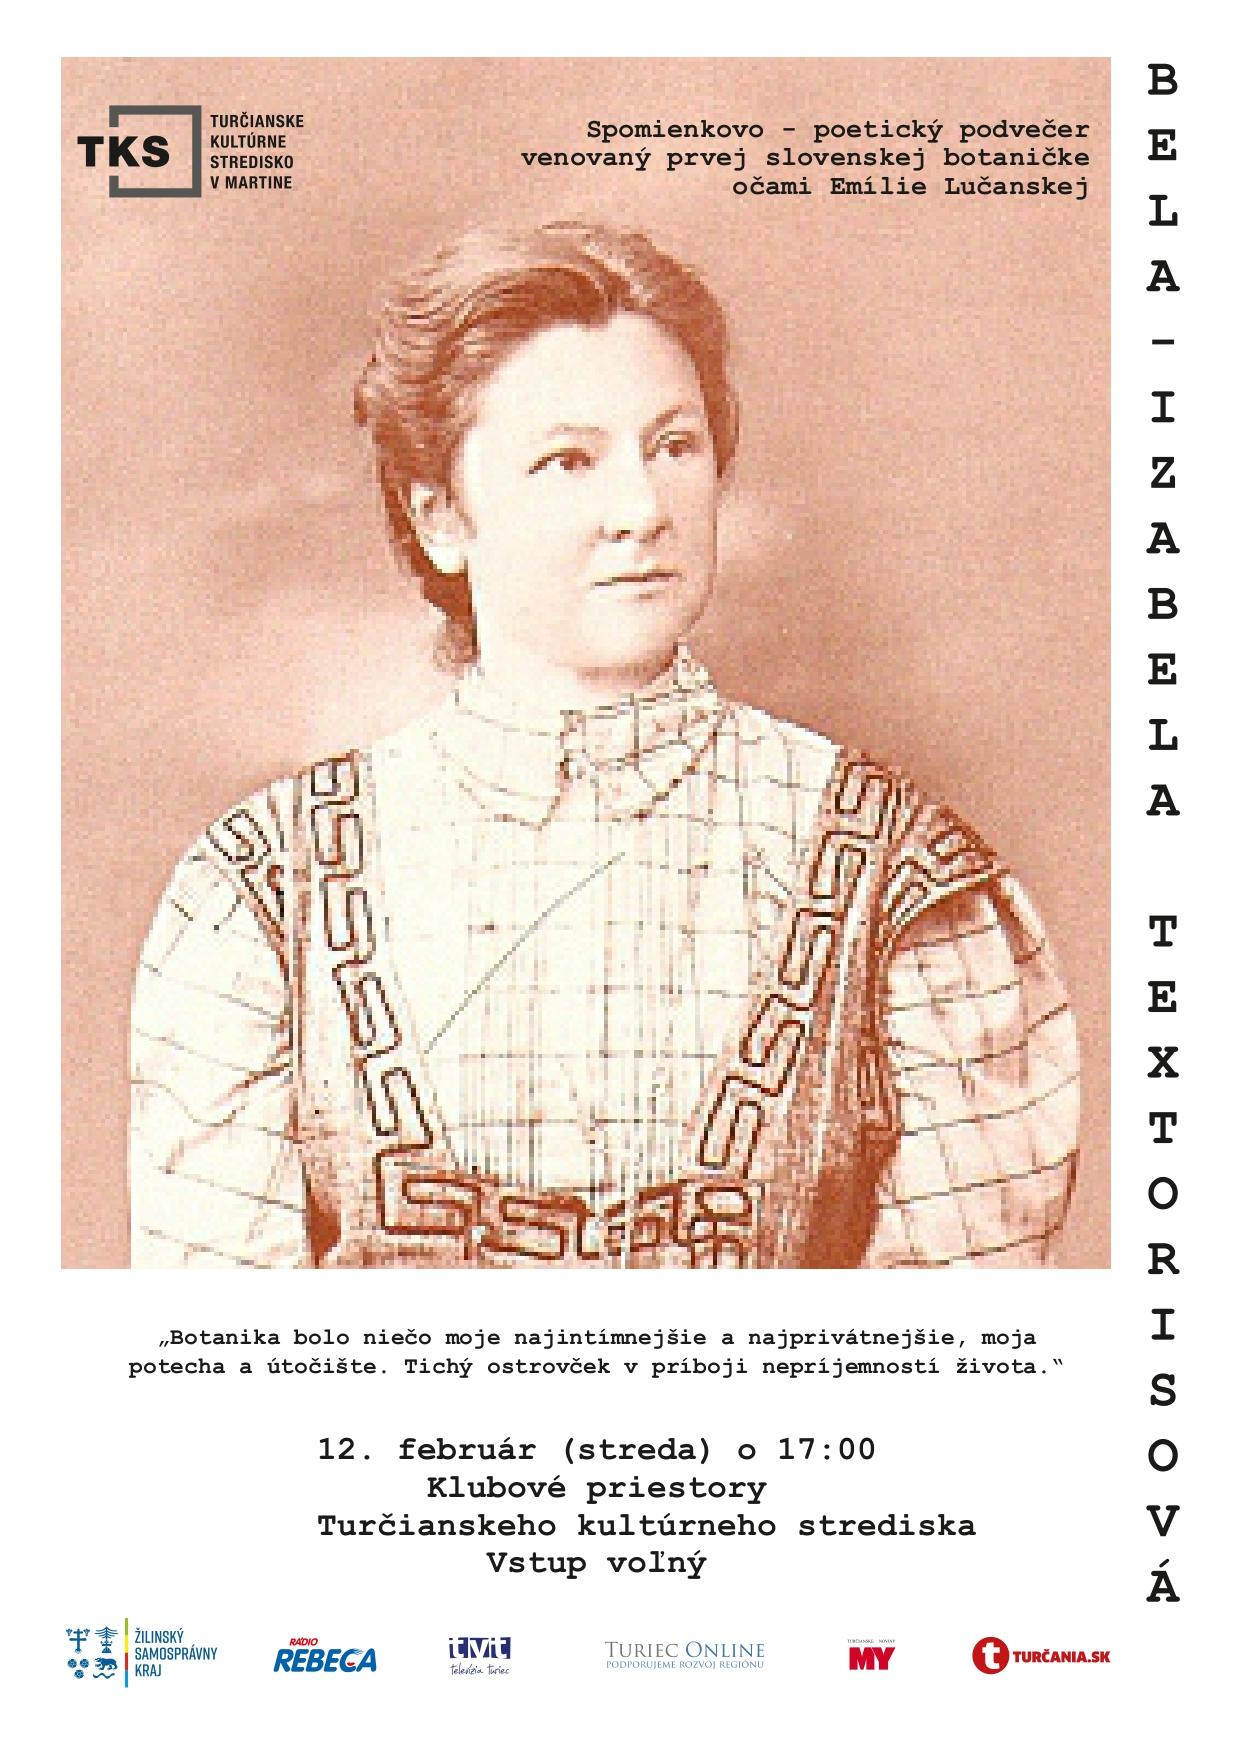 Bela Izabela Textorisová